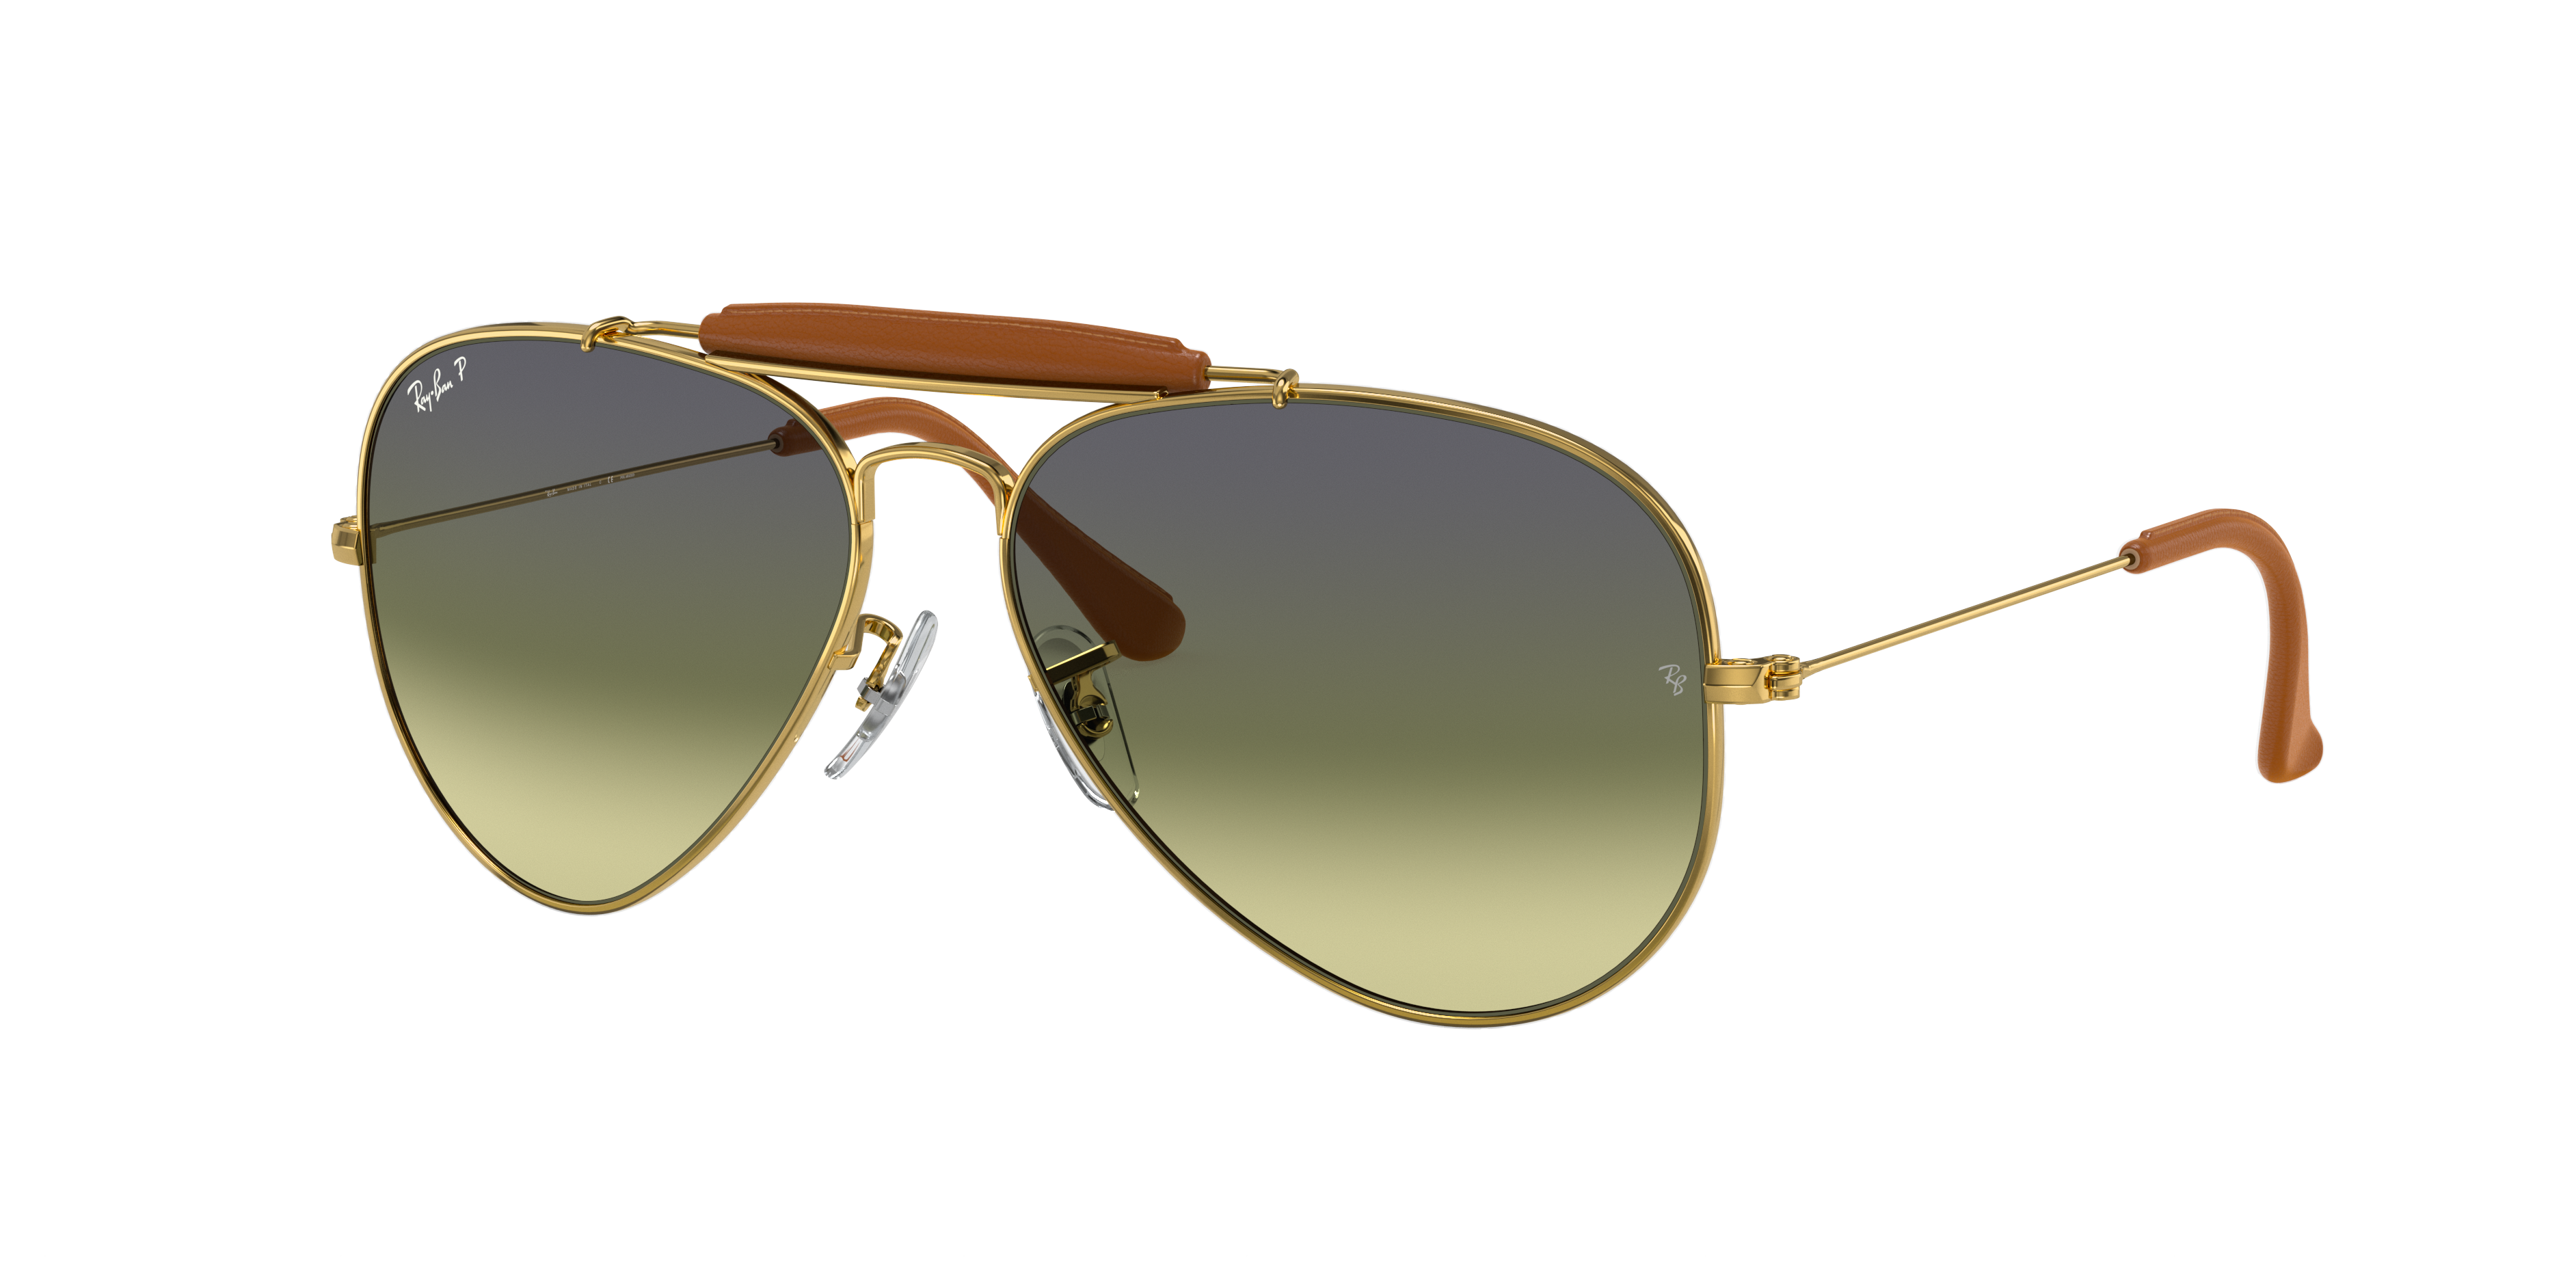 Ray-Ban Outdoorsman Craft Gold, Polarized Green Lenses - RB3422Q